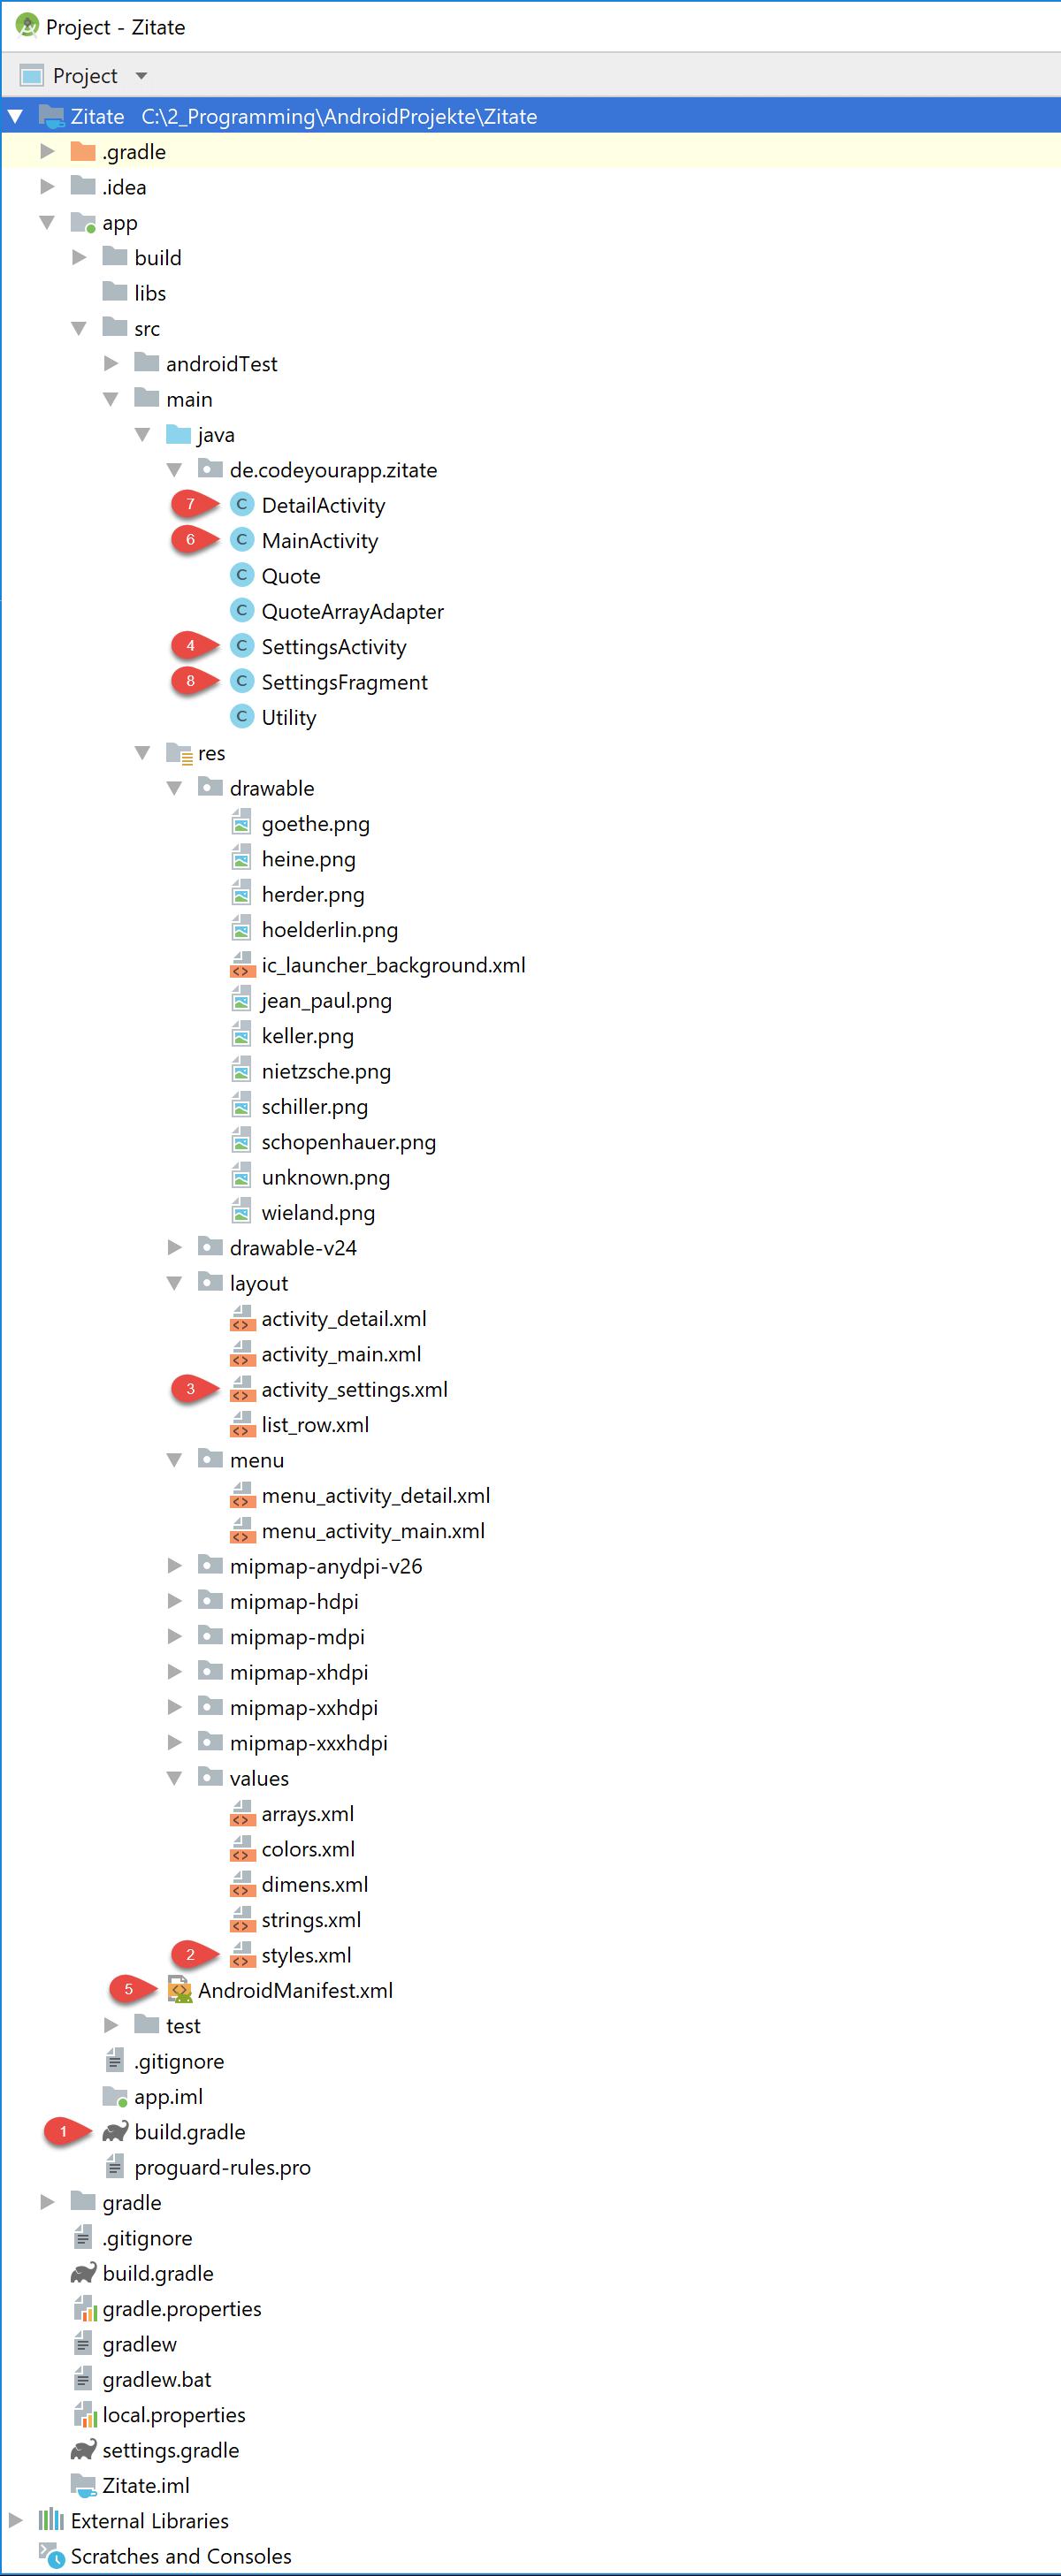 projekt_struktur_10-1ggg